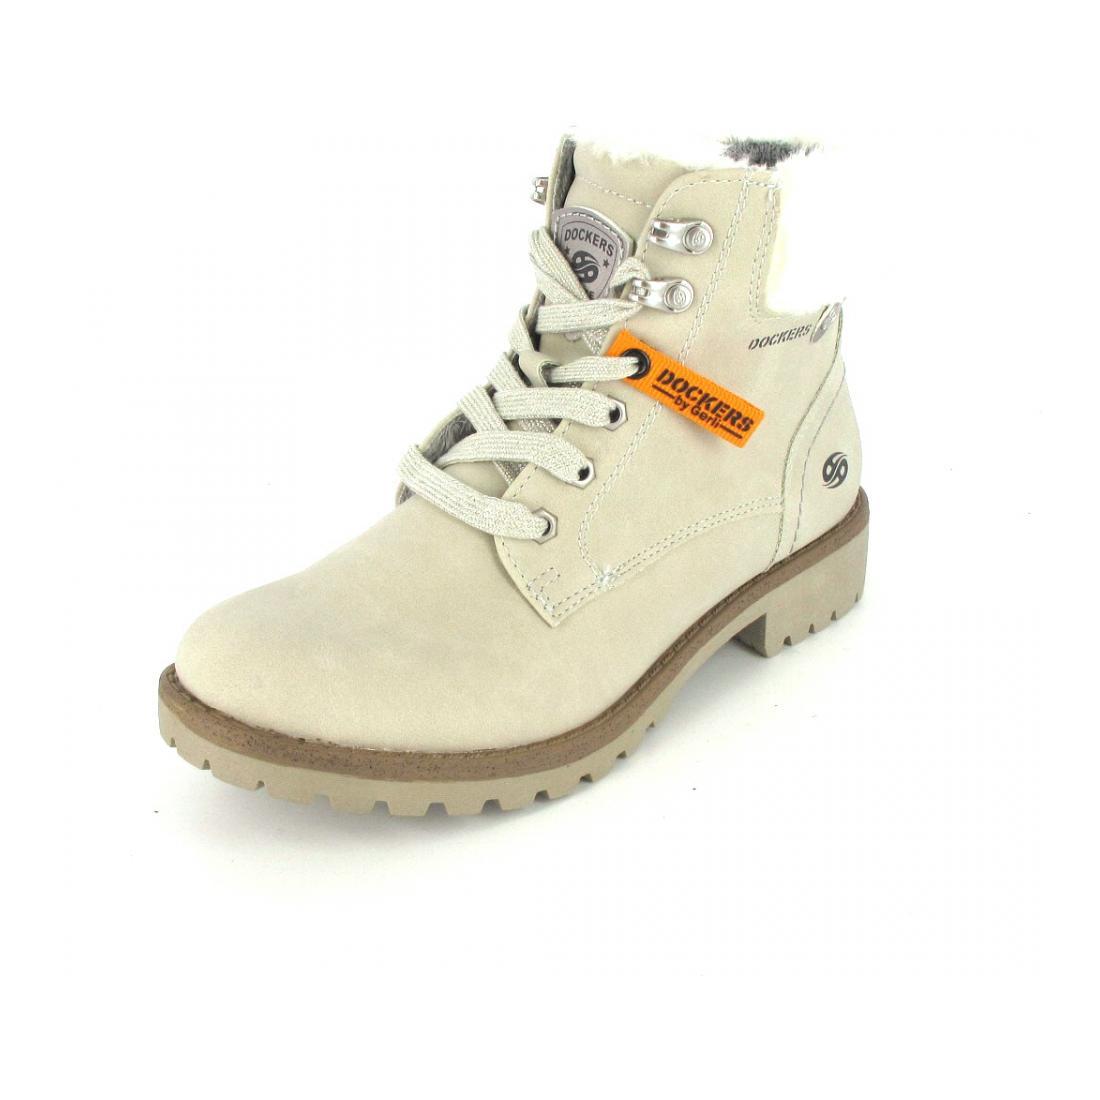 Dockers Boots 260 ICE